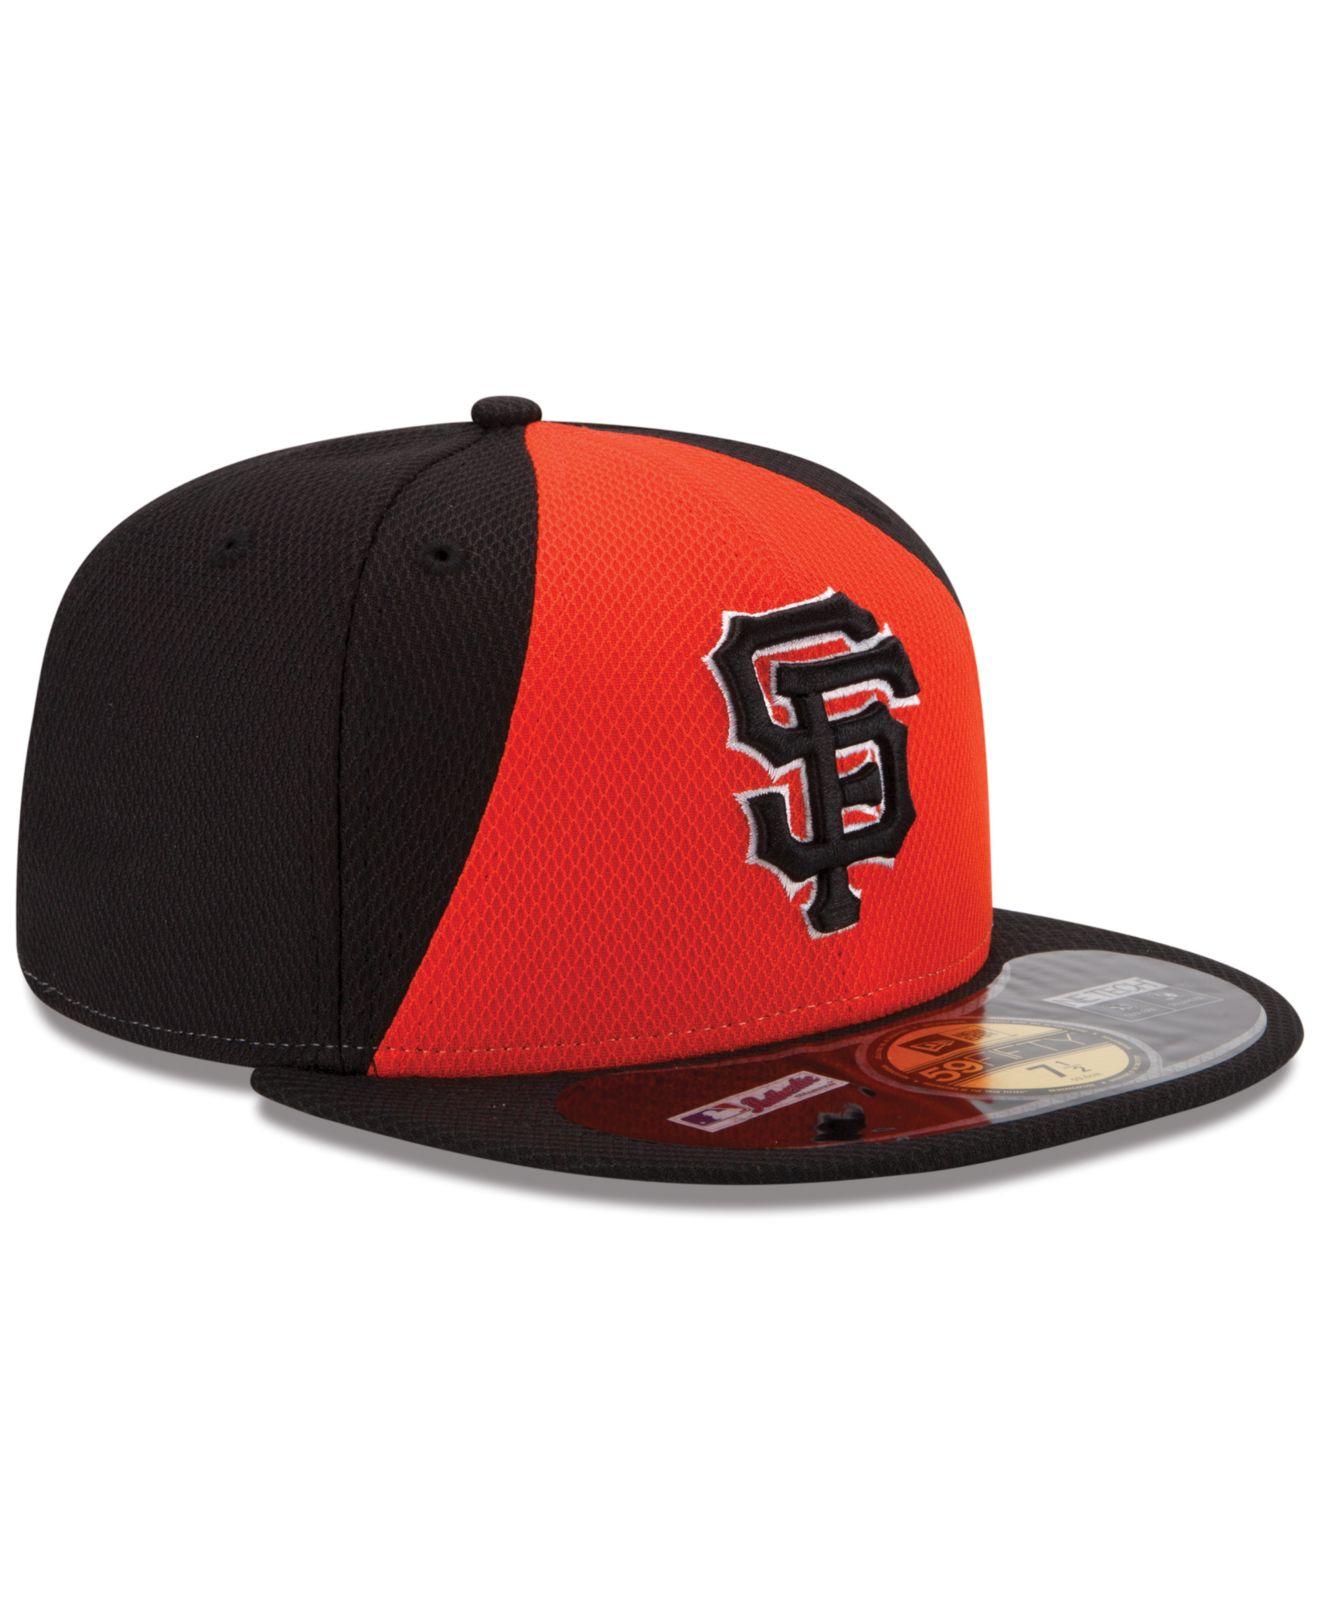 best service 5166d f766b reduced san francisco giants bucket hat 400 3f607 7bb59